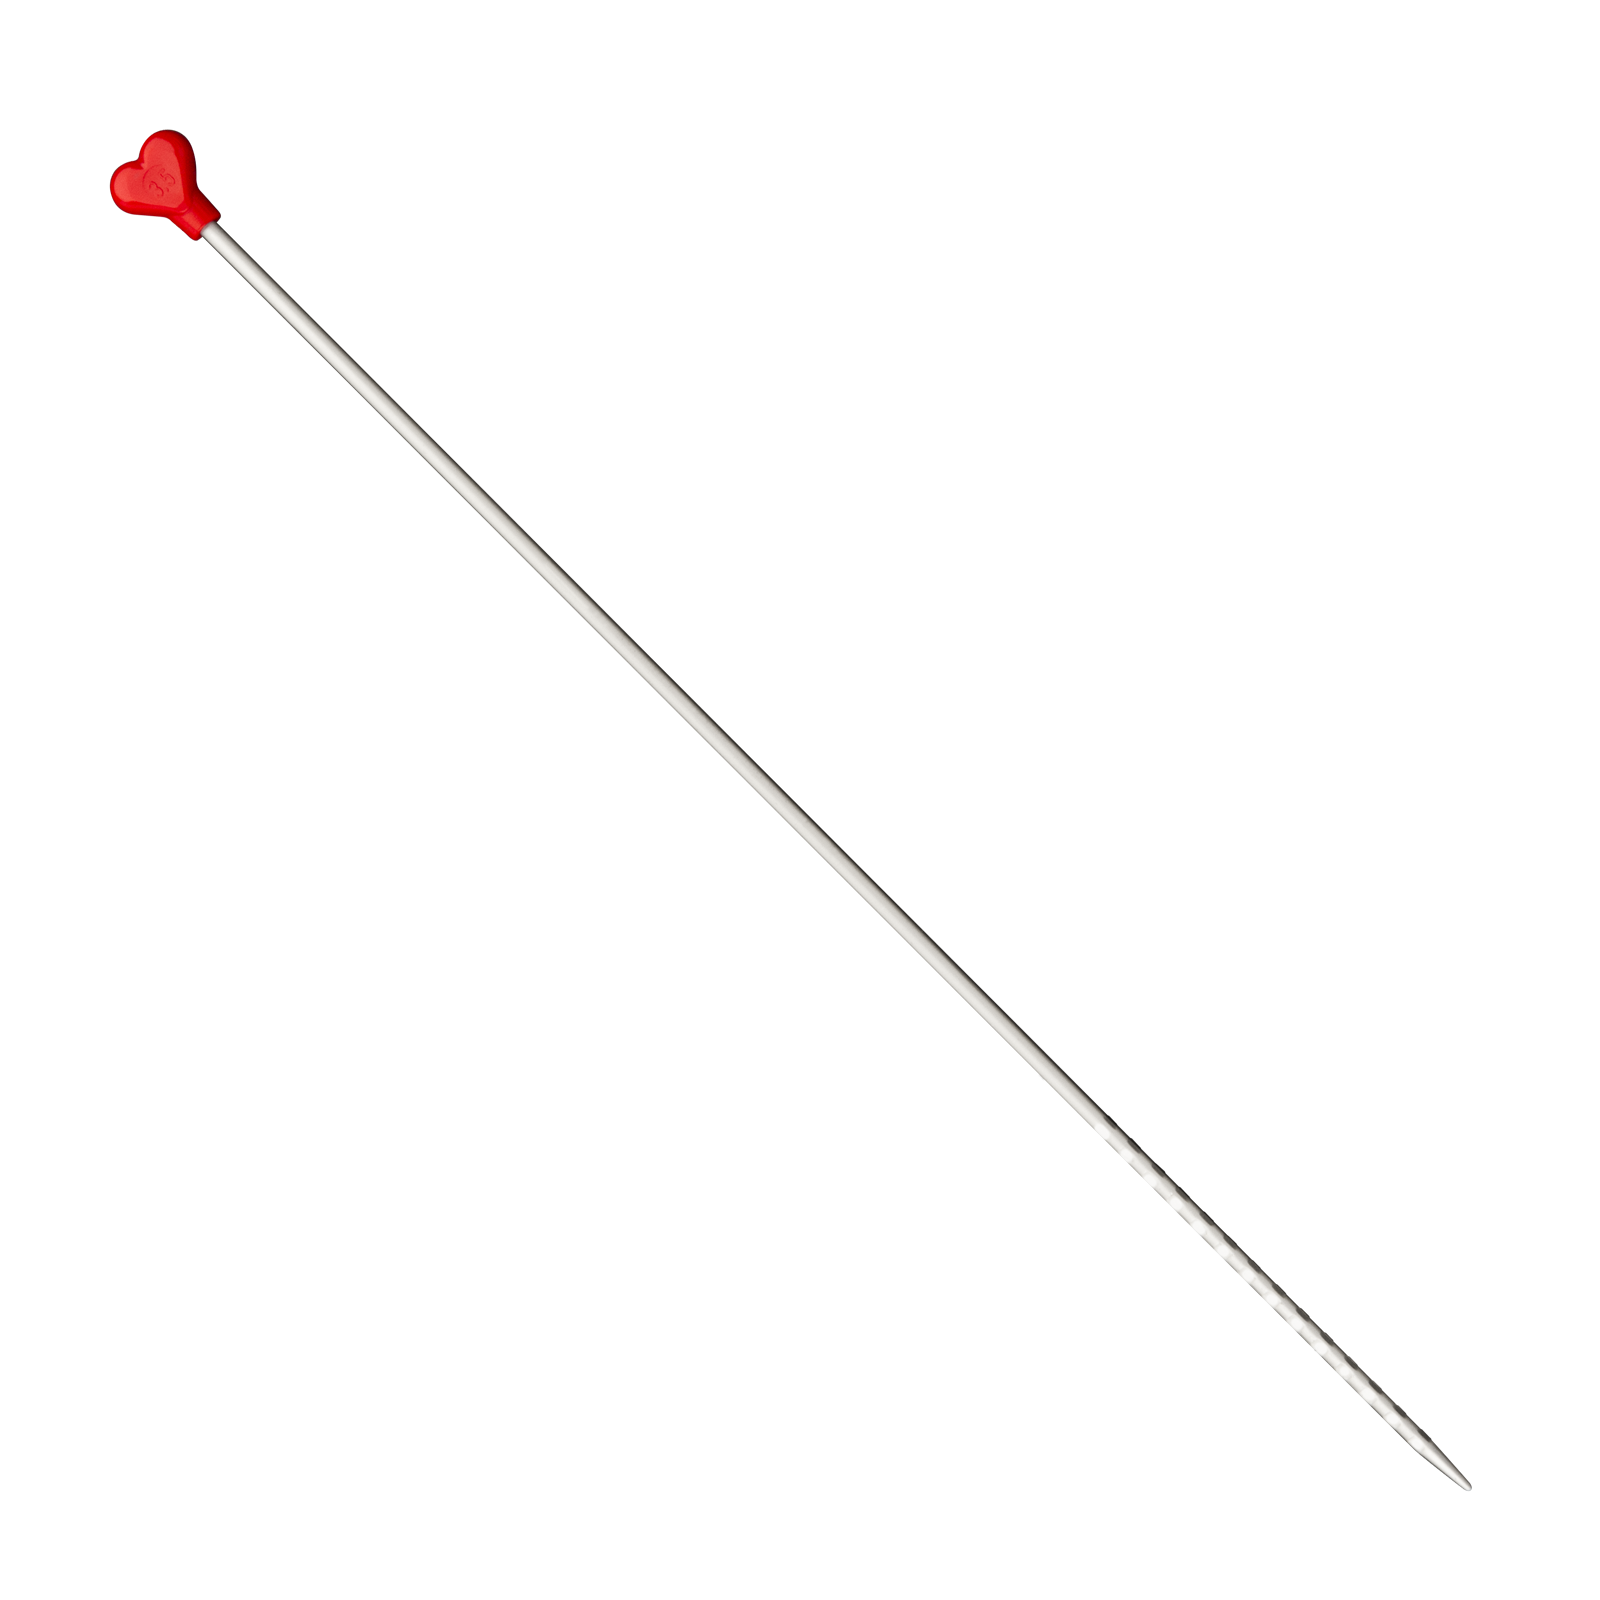 Addi 217-7 Jackenstricknadeln 35cm